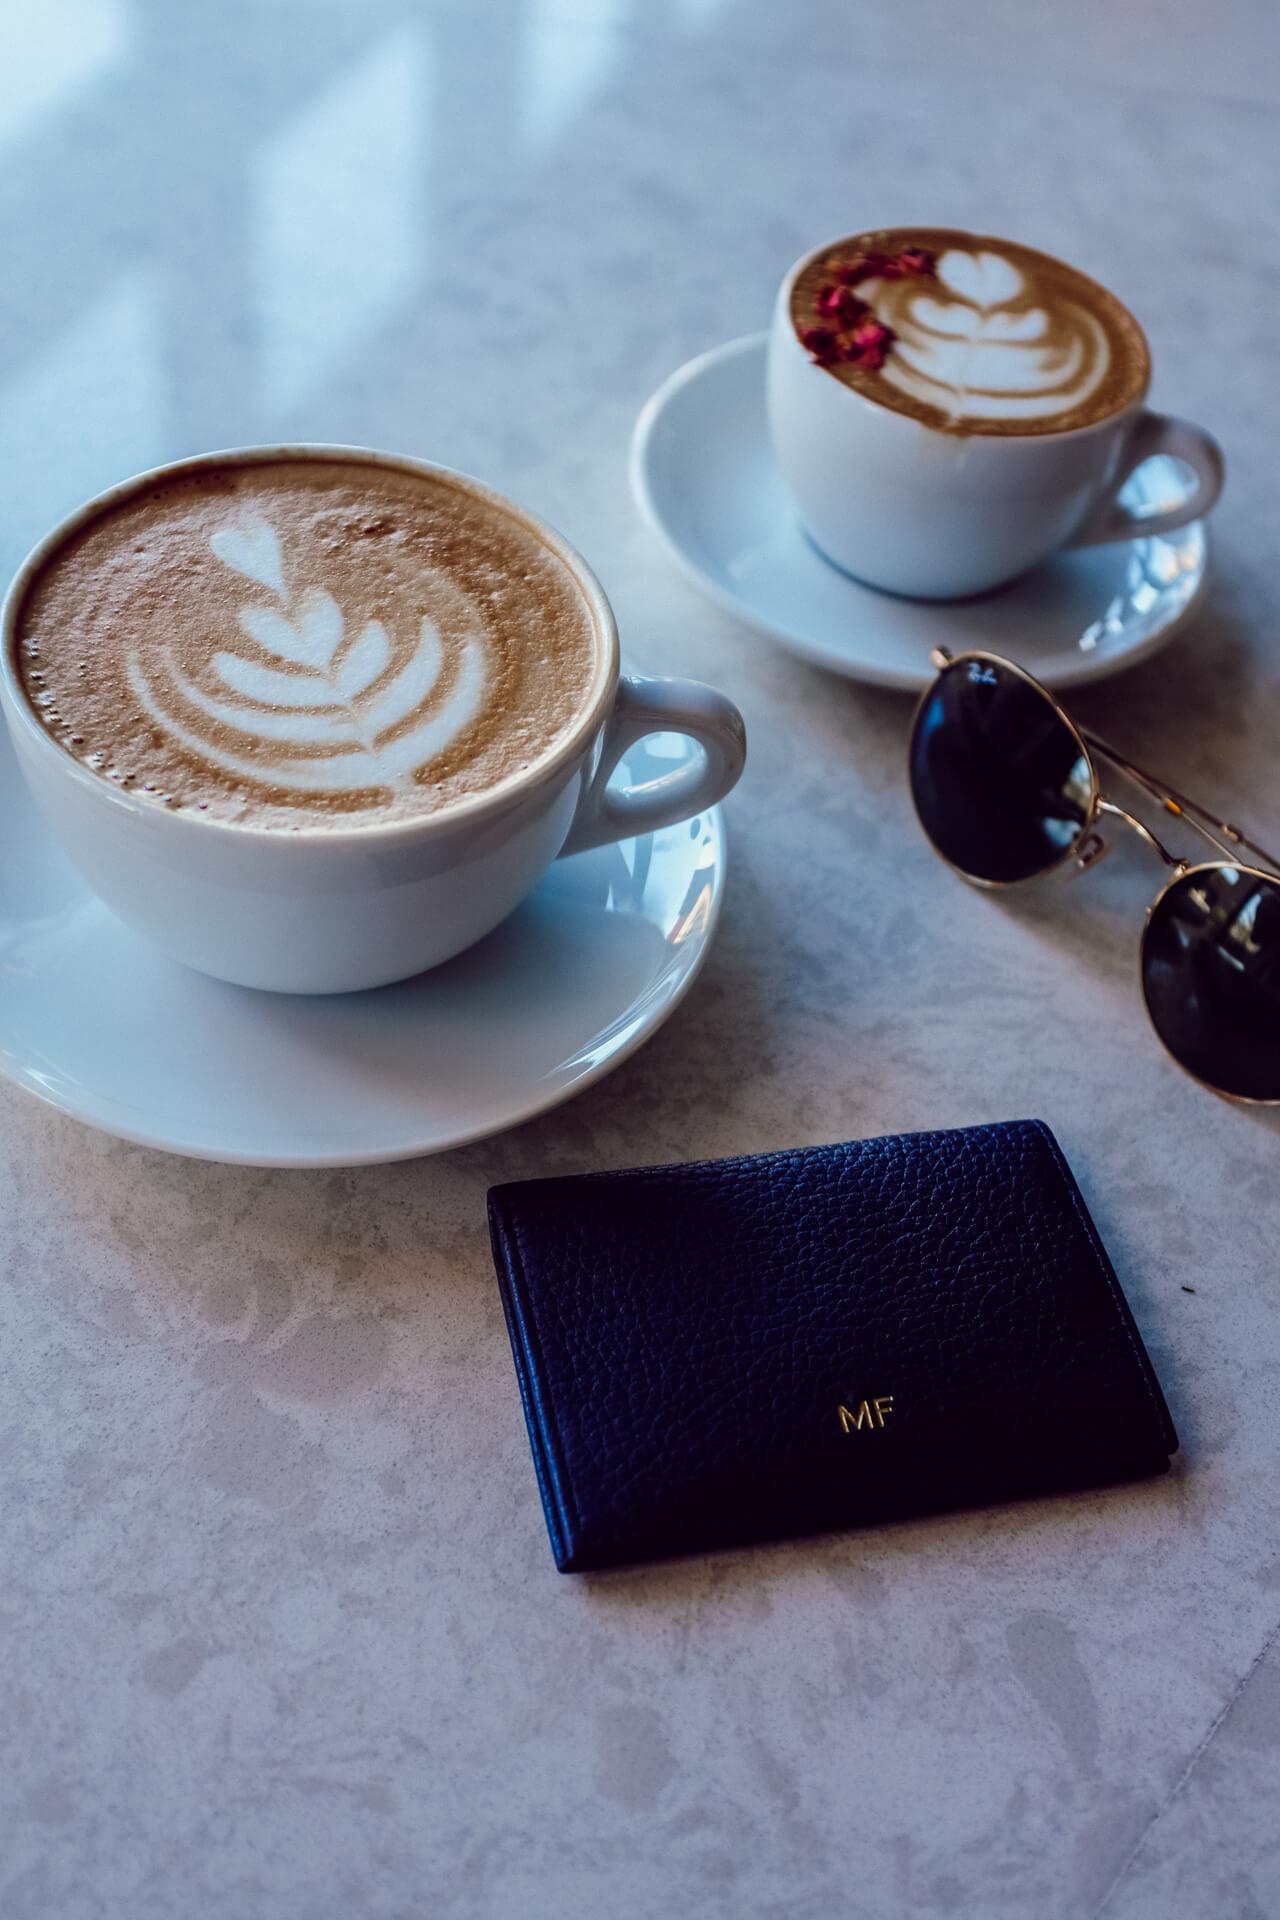 Perfect coffee for a day trip in LA